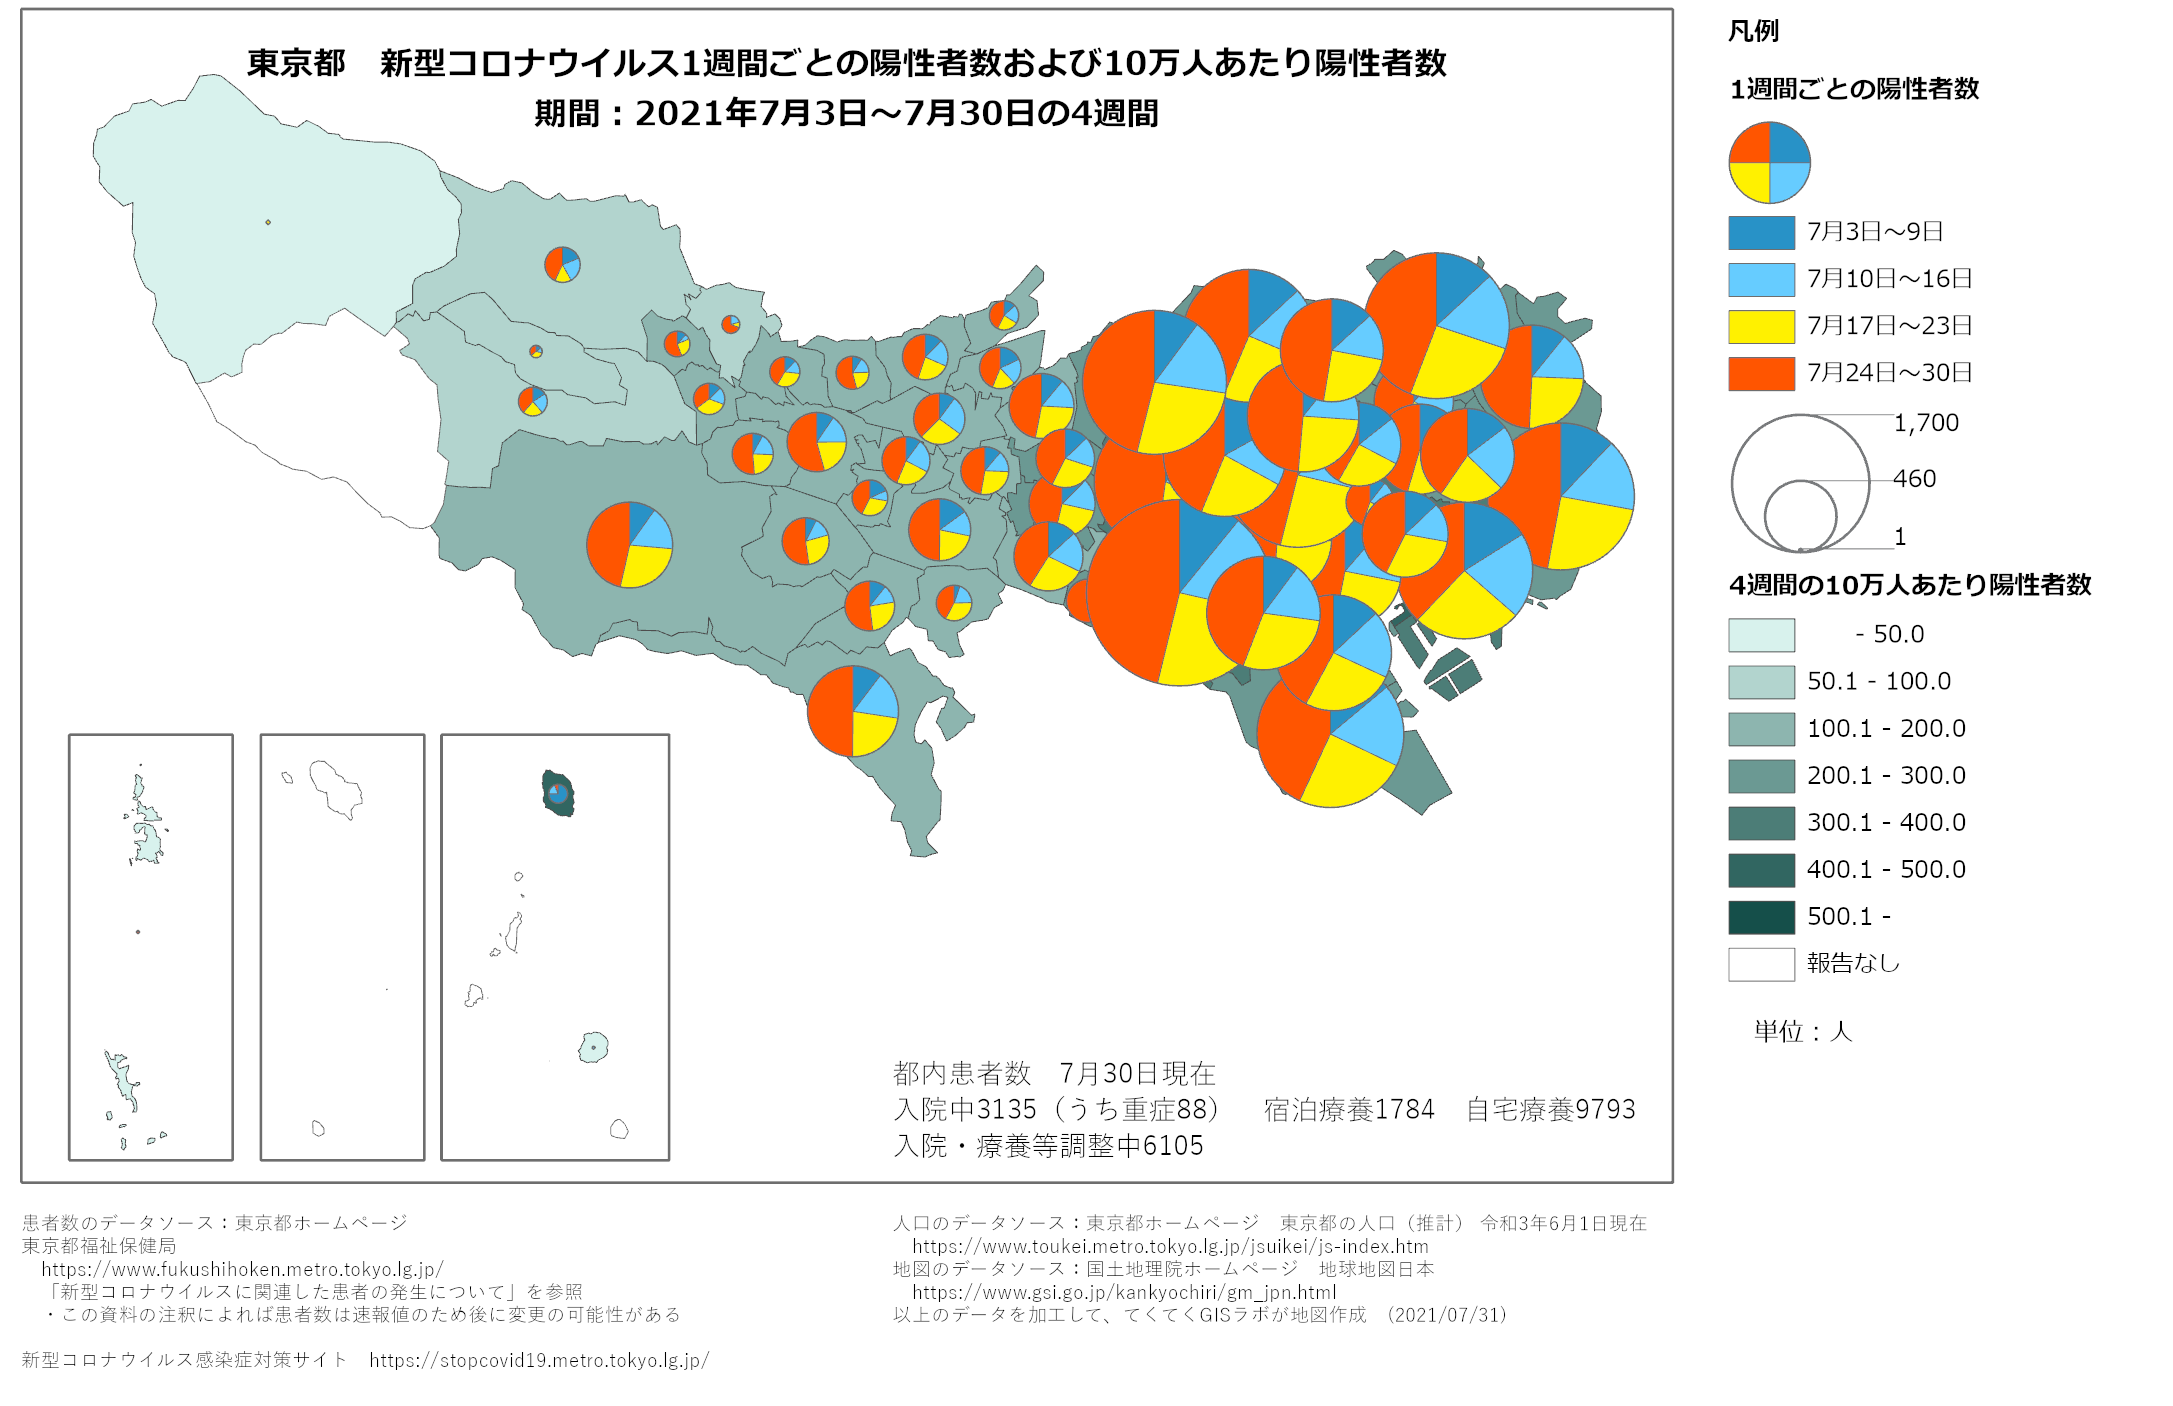 1週間ごと感染者数、東京都、7月3日〜7月30日